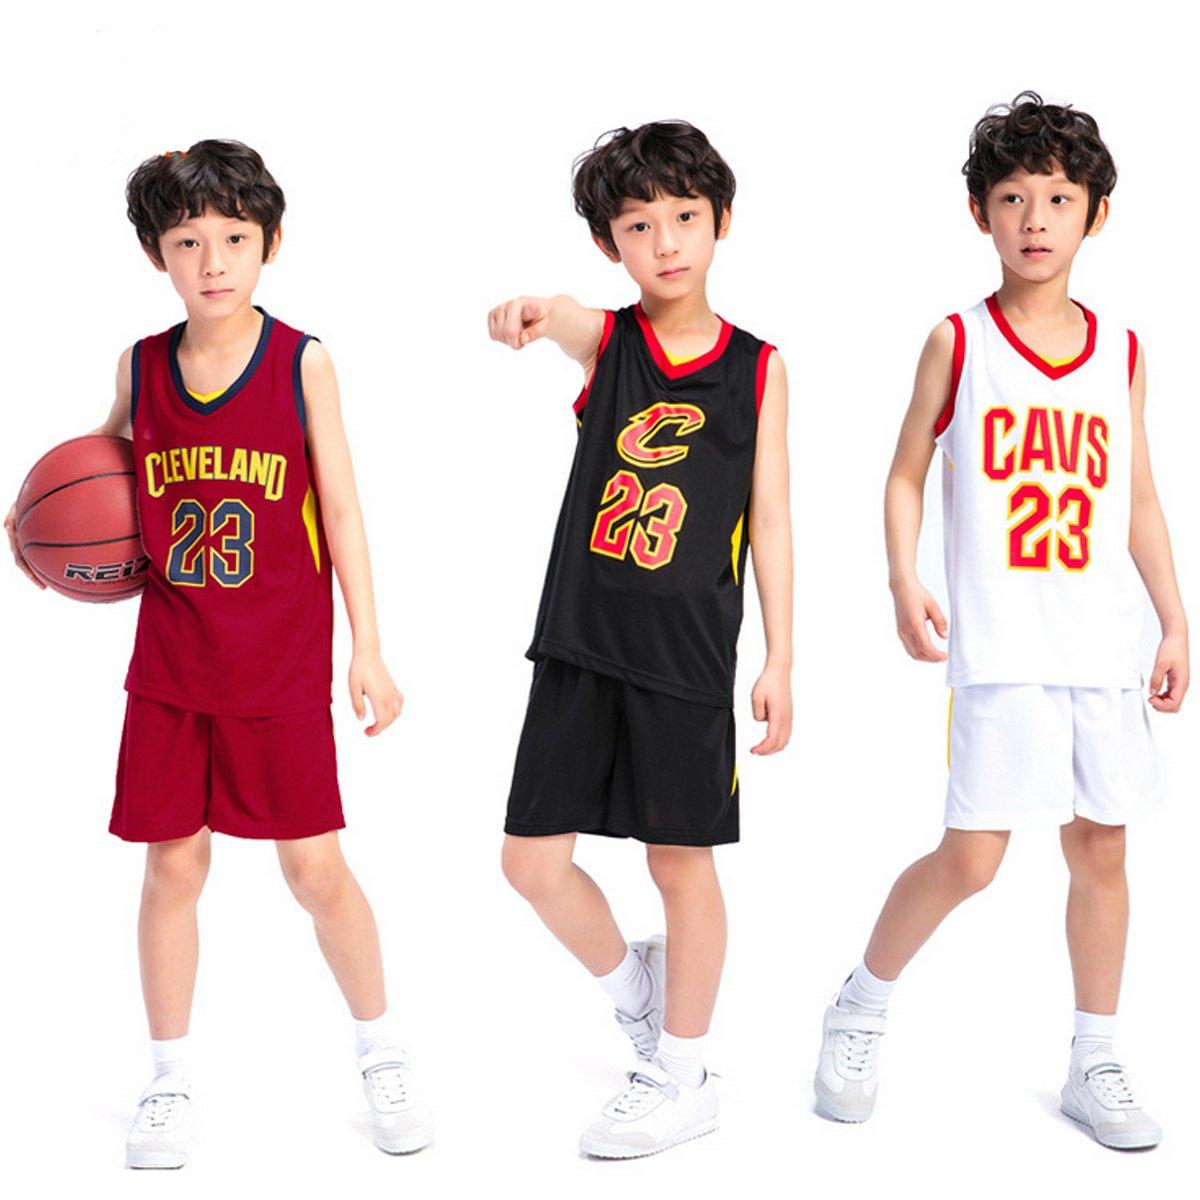 a9a0617a76b Kids Boys Cleveland Cavaliers LeBron James  23 Basketball Shorts Summer Jerseys  Basketball Uniform Top Short  Amazon.co.uk  Sports   Outdoors